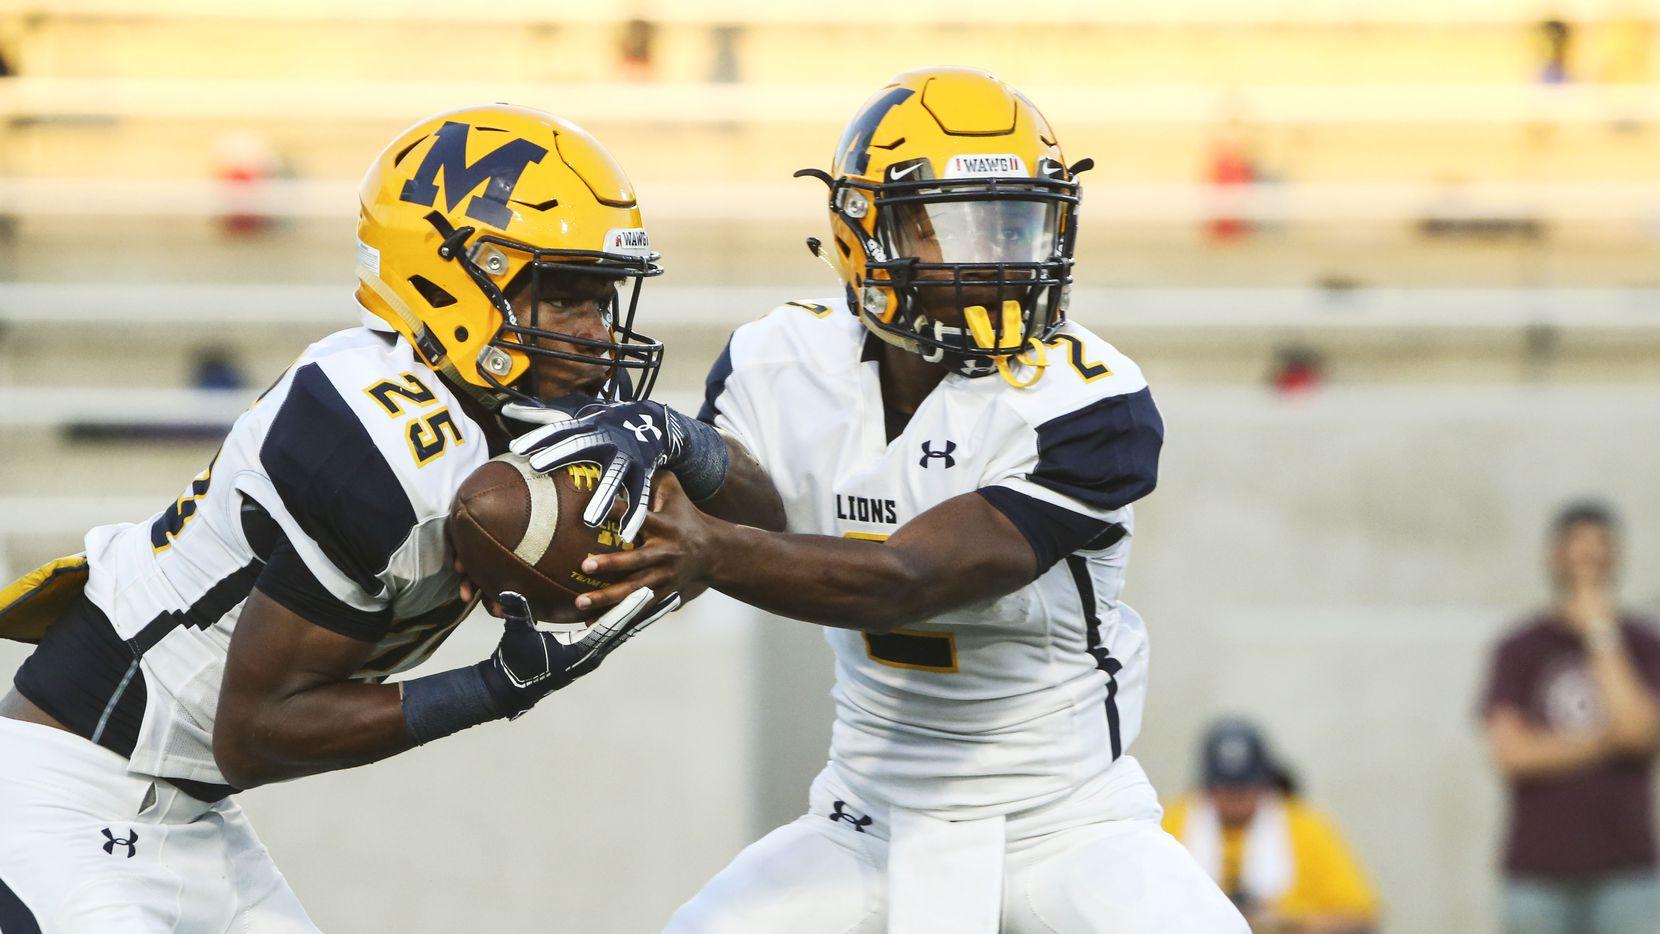 McKinney's Adrian Shepherd (25), left, grabs the ball as Kelvin Thomas (2) passes during a high school football game between McKinney and McKinney North on Thursday, on Aug. 30, 2018 at McKinney ISD stadium in McKinney, Texas.